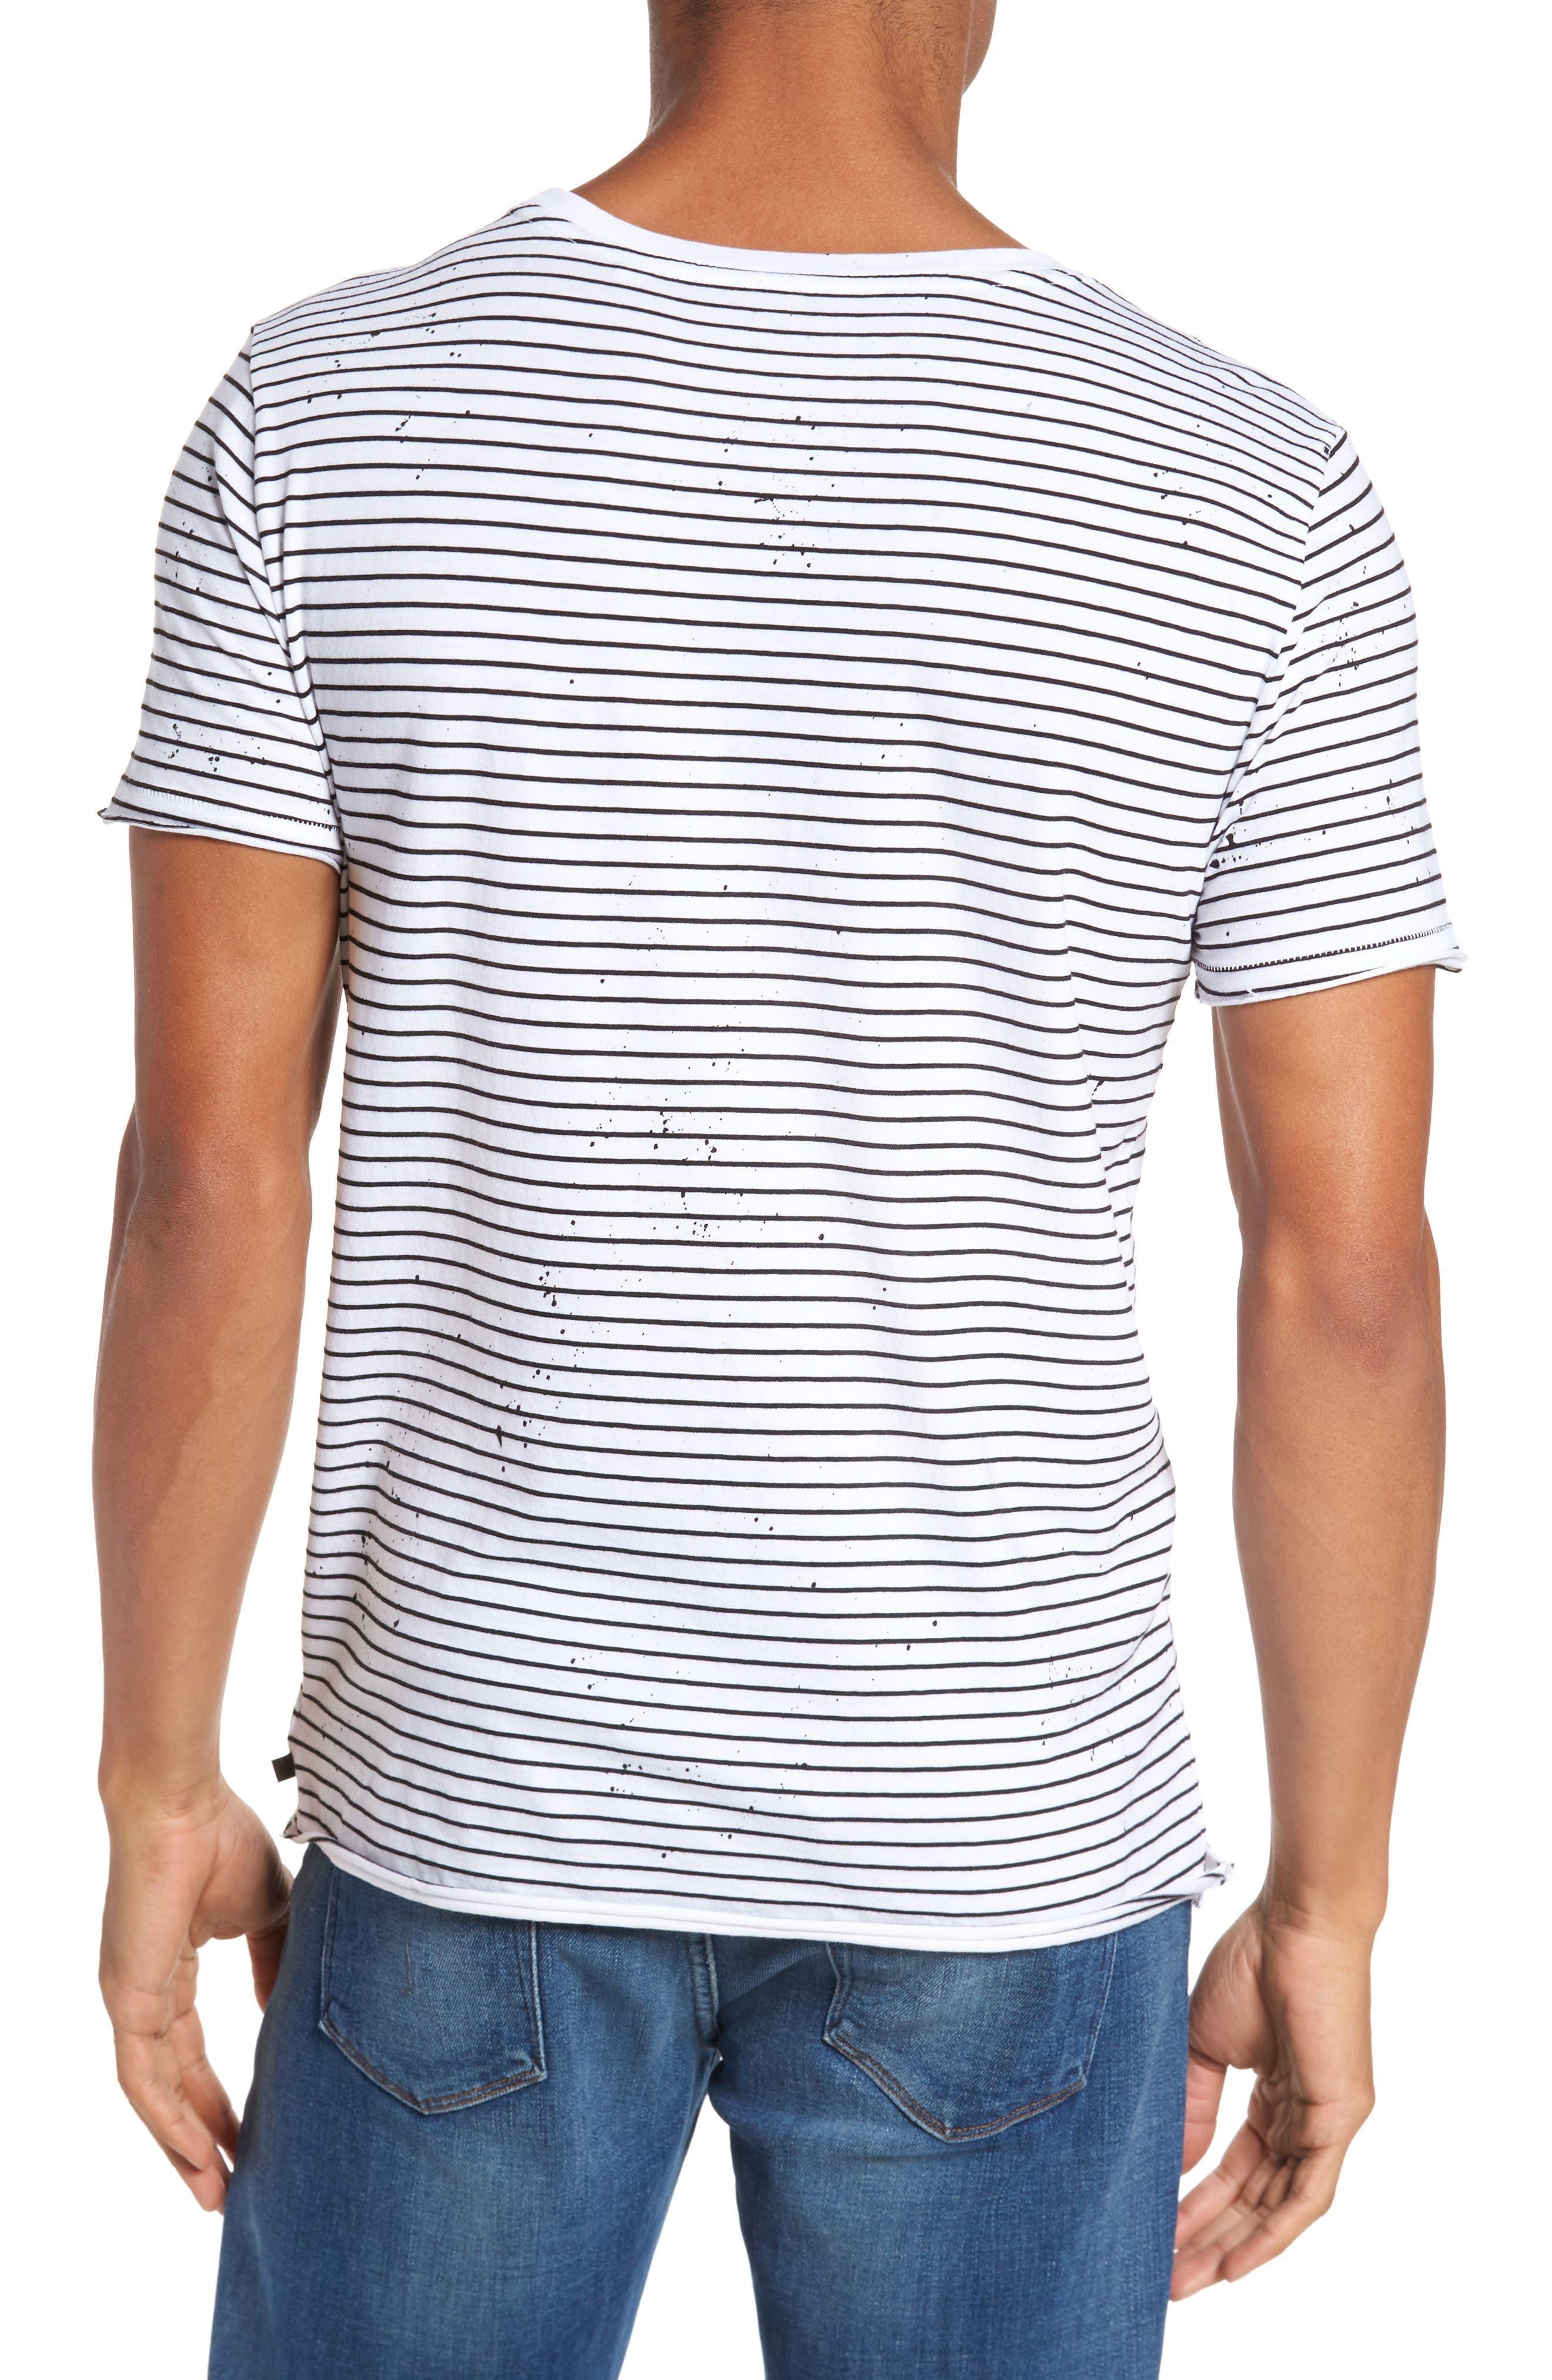 Julian Slim Fit Stripe Raw T-Shirt,                             Alternate thumbnail 2, color,                             100